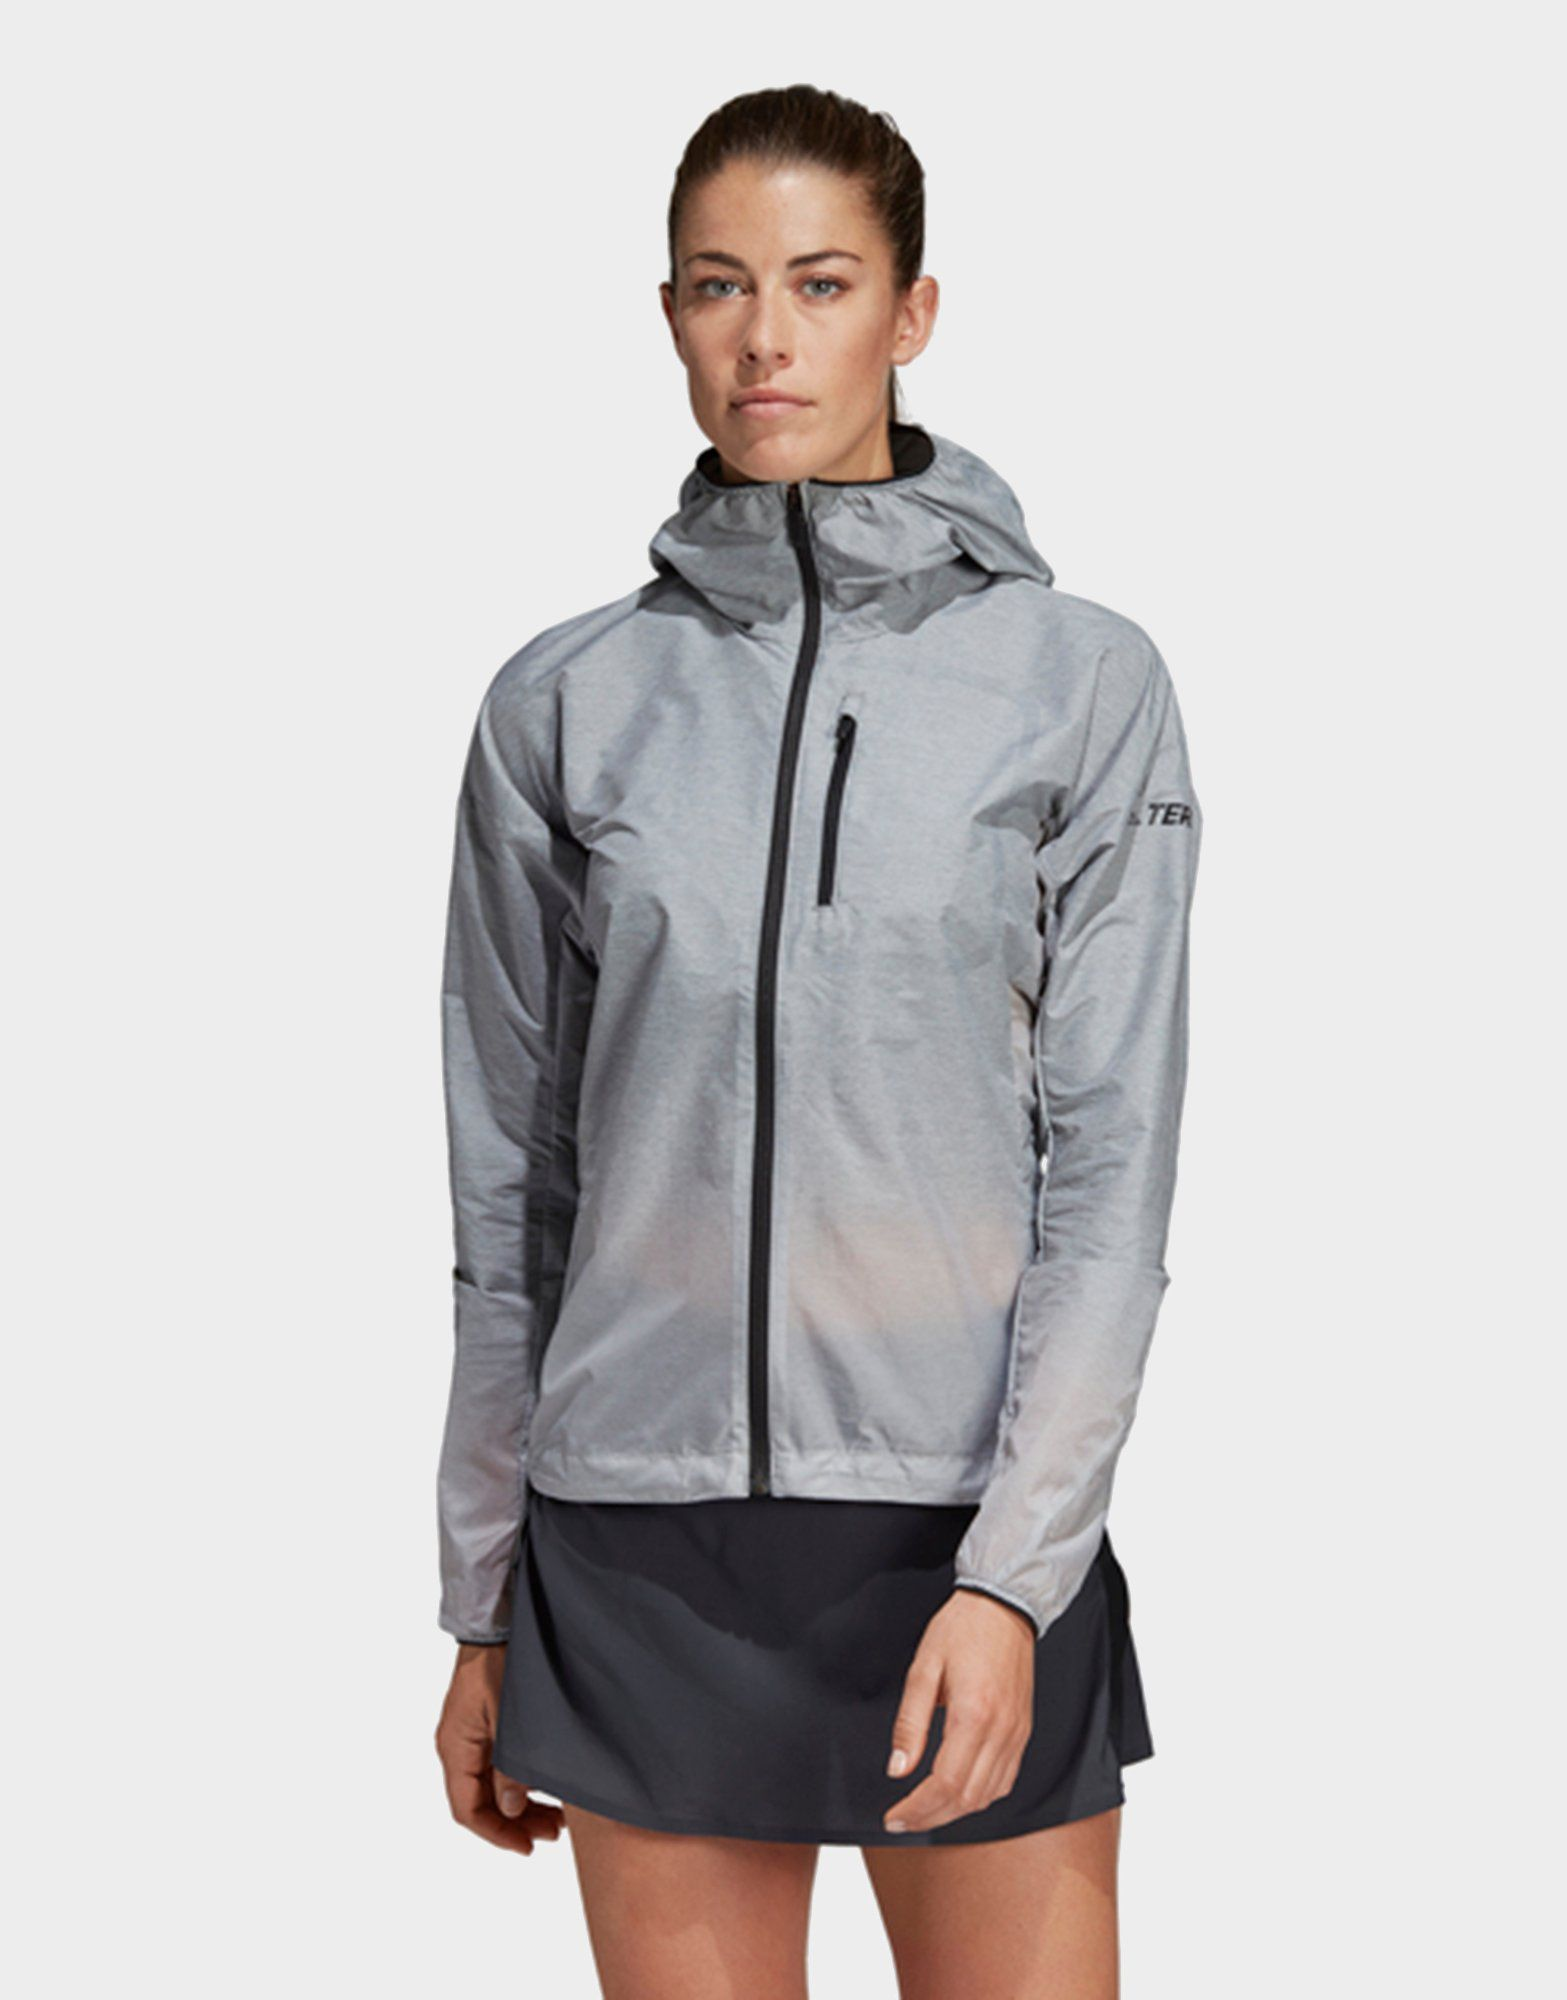 adidas dress pants, Adidas Terrex Agravic Windjacket Jackets